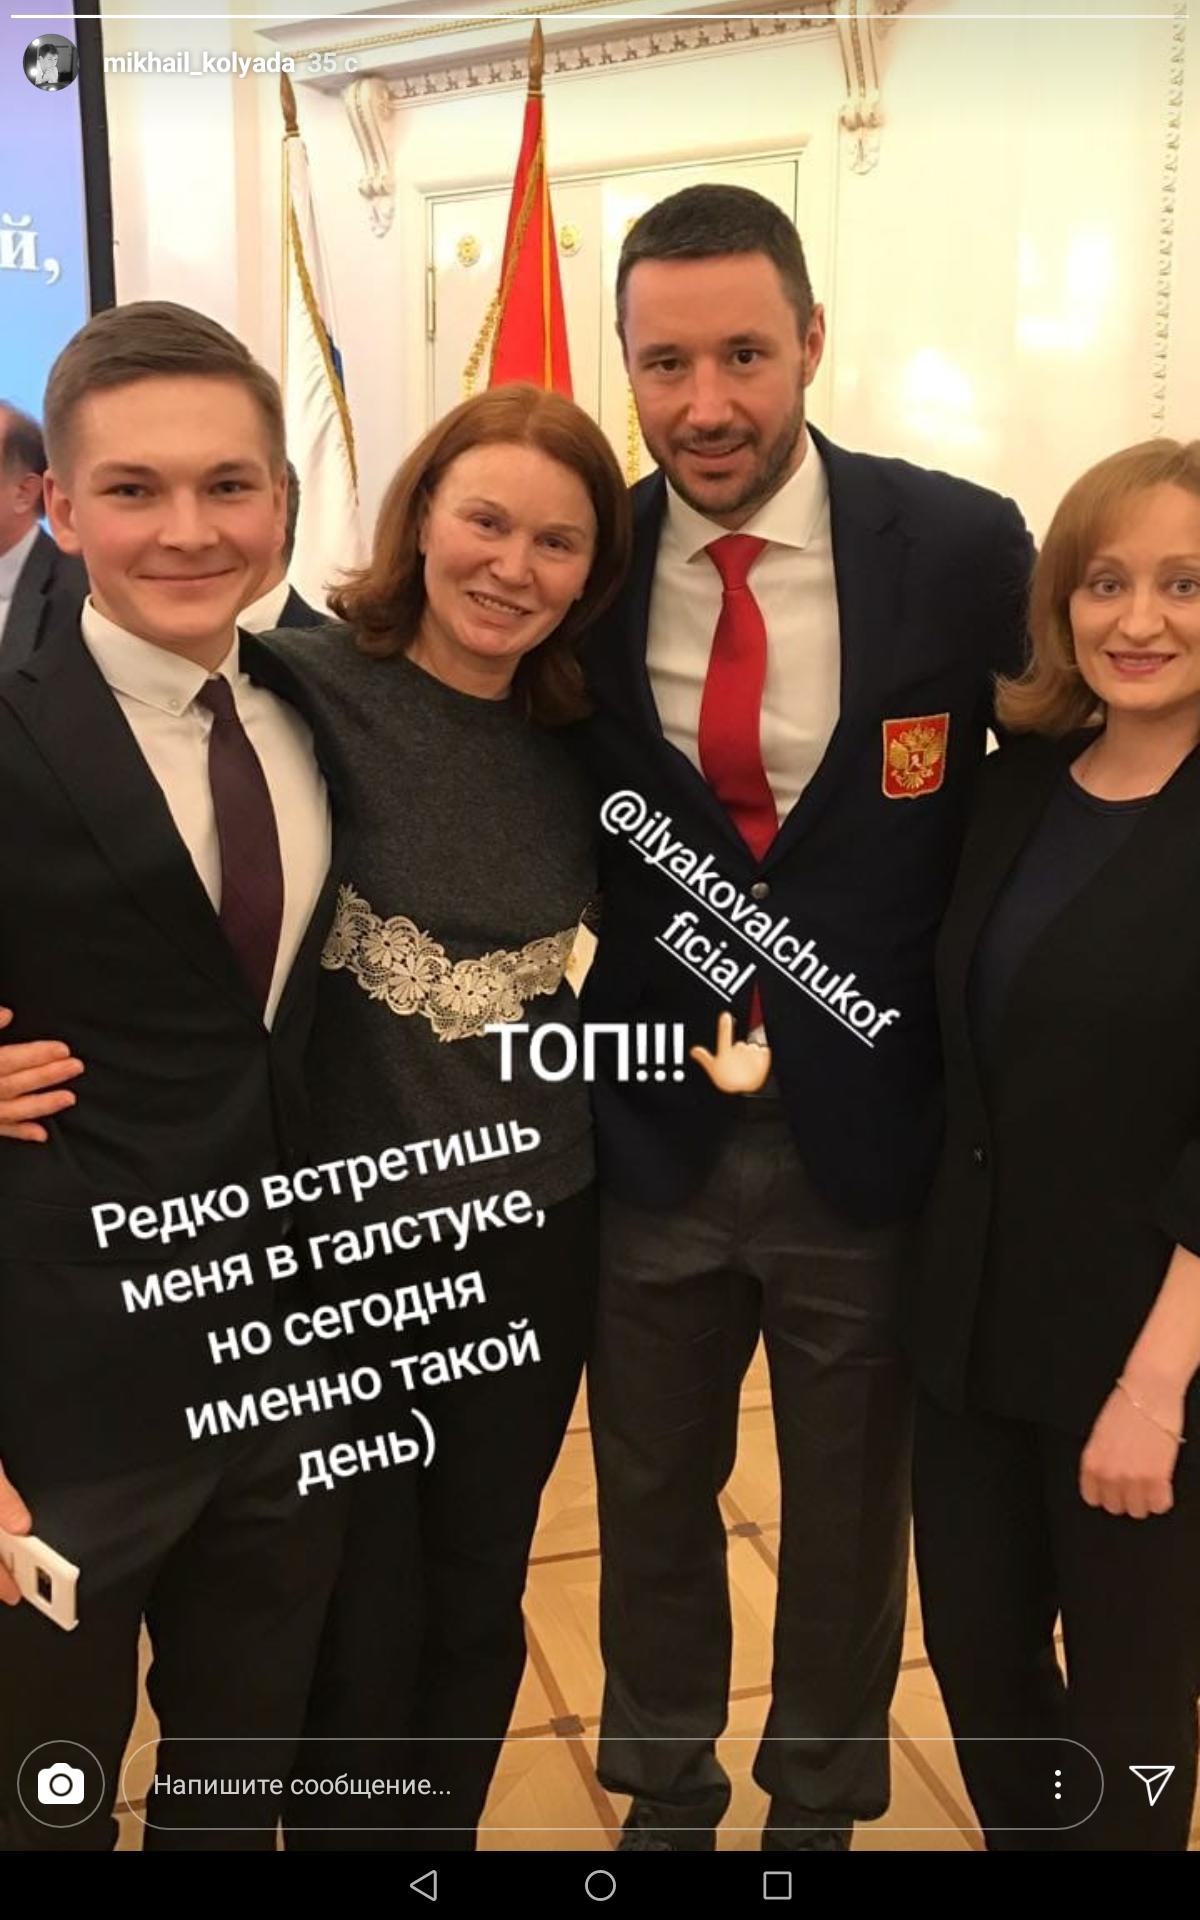 http://s8.uploads.ru/jqxkT.png